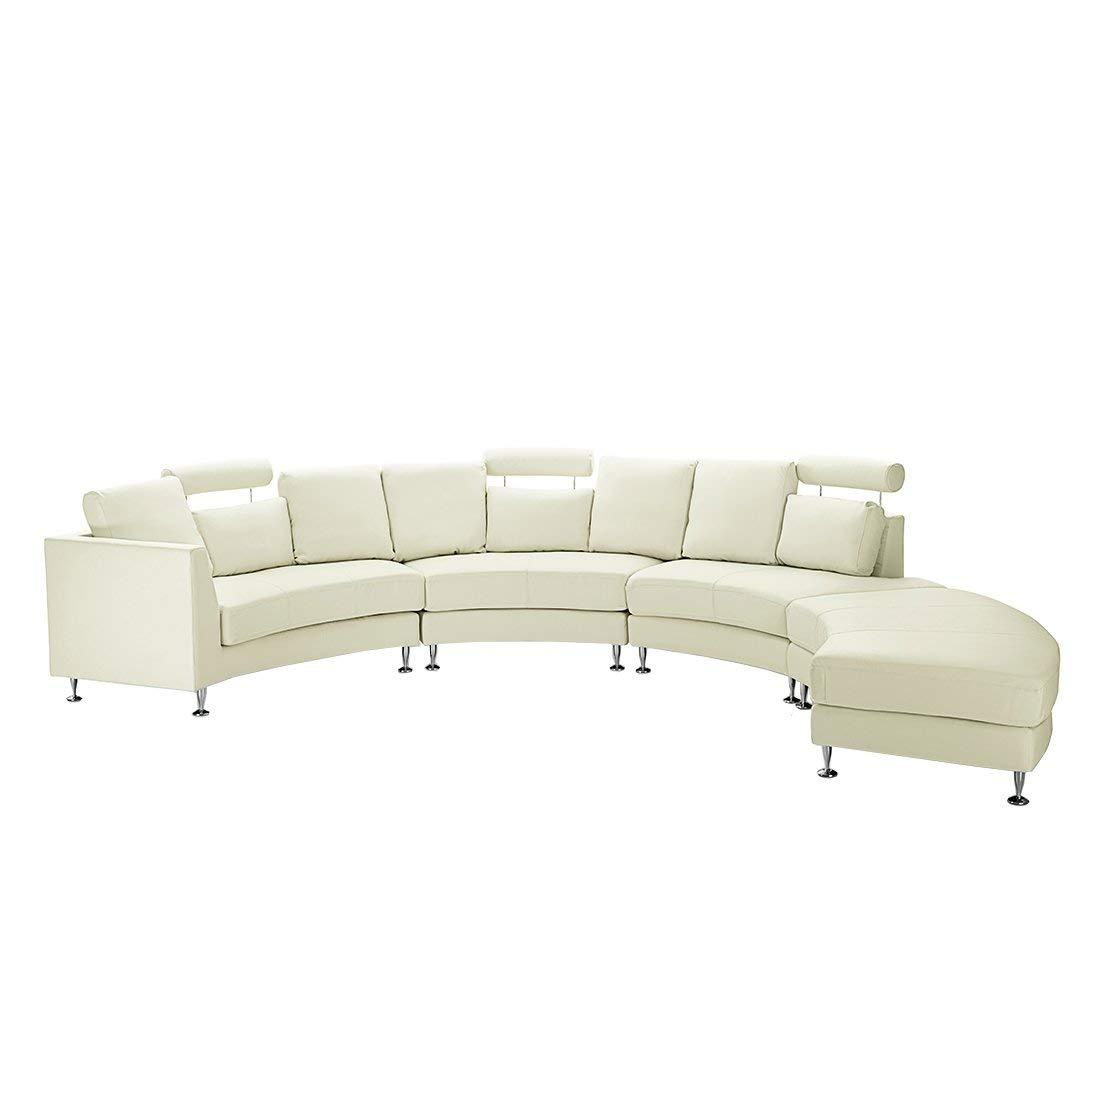 Sofá Redondo Crema - sofá de Piel - sofá 7 plazas - ROTUNDE ...